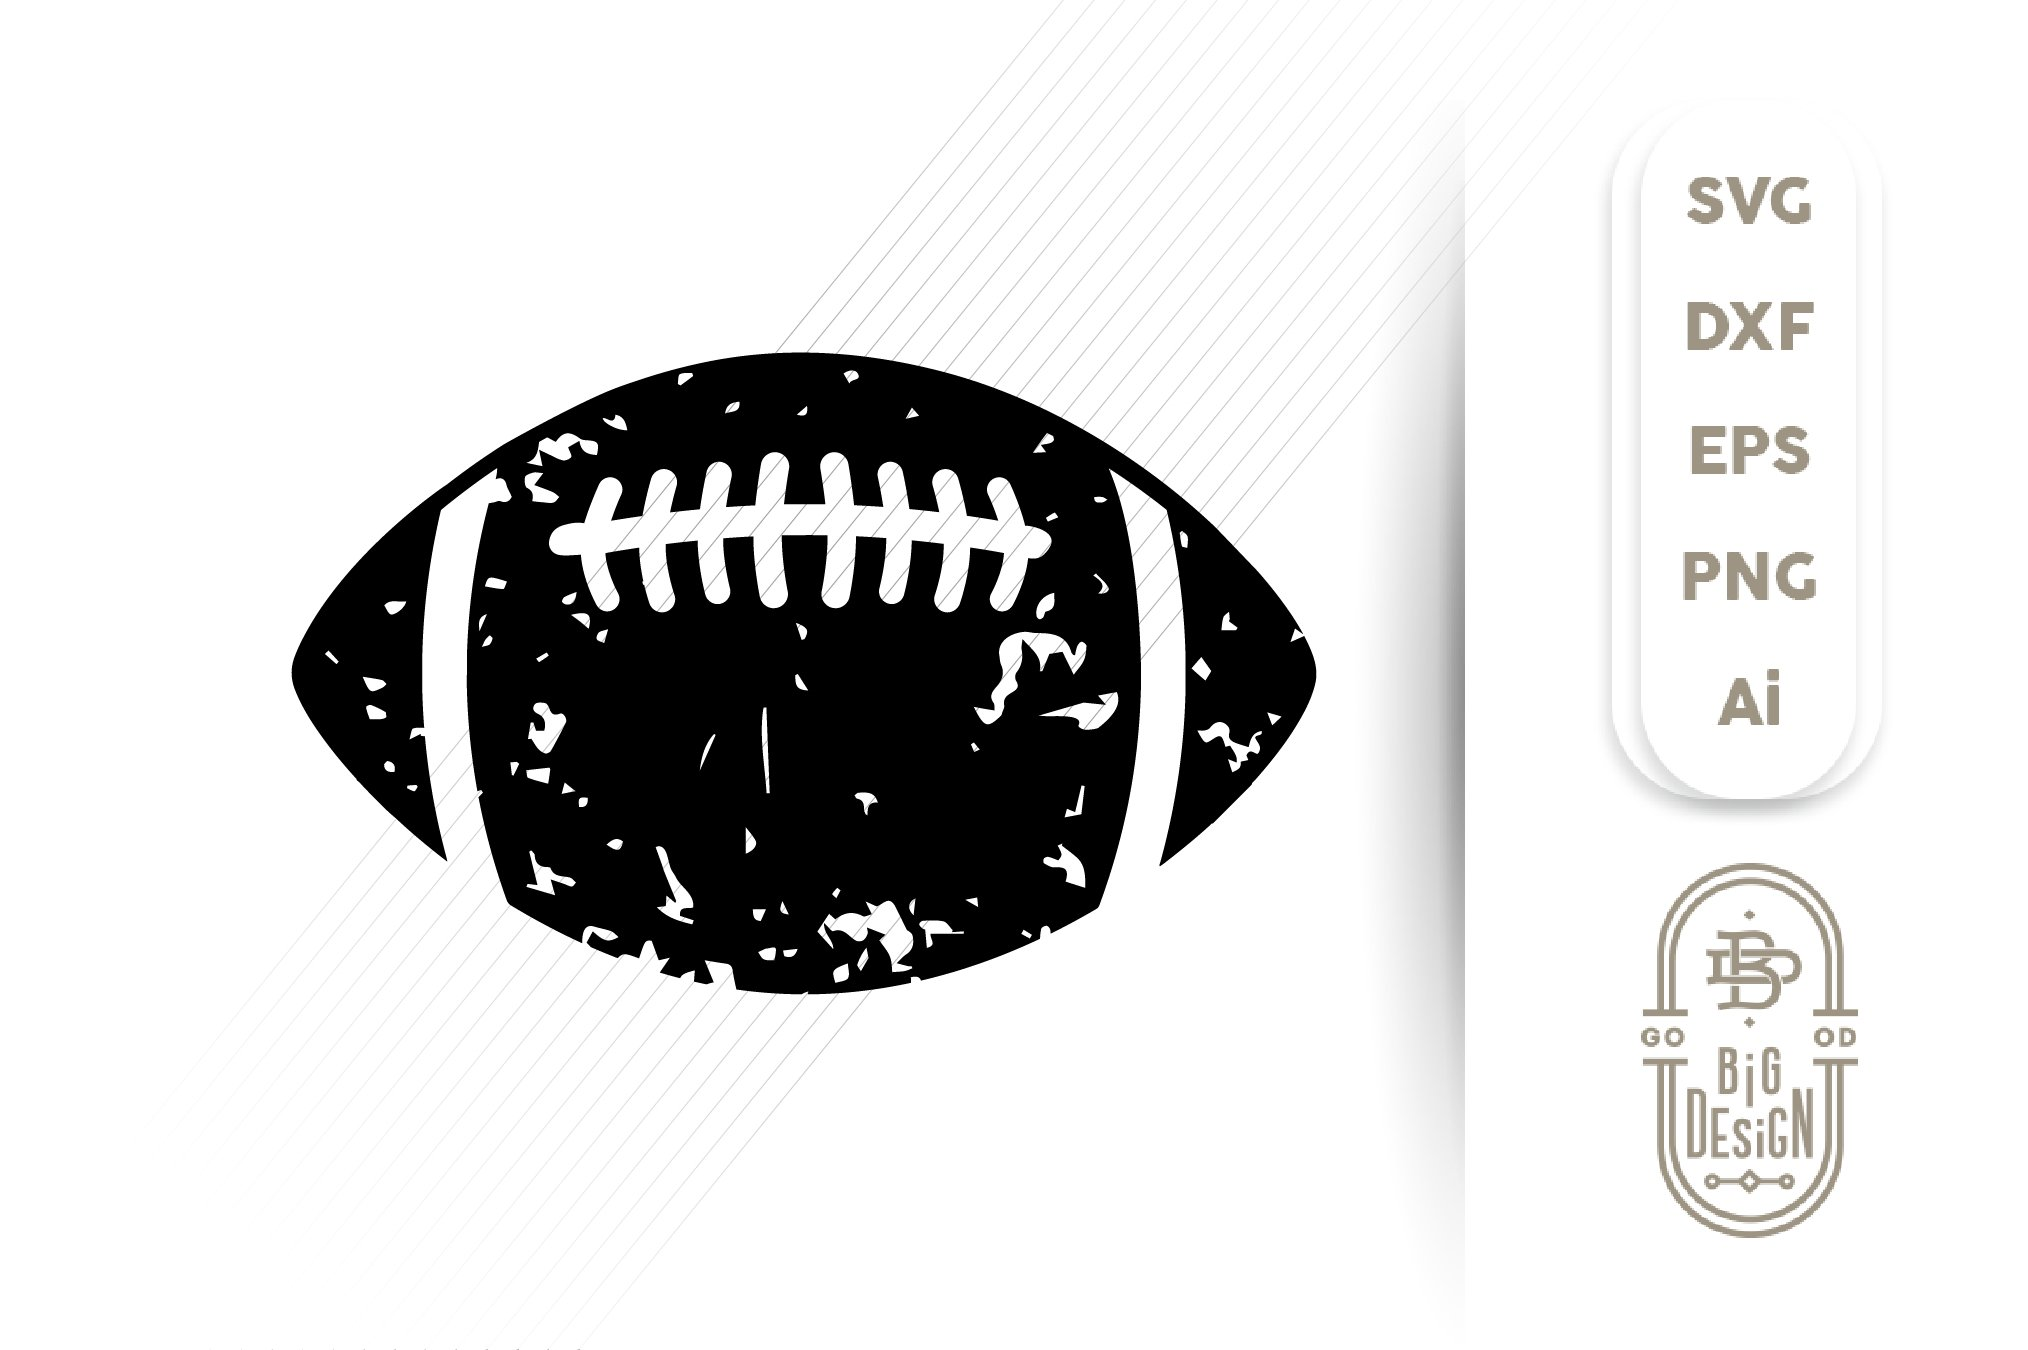 Football Svg Distressed Football Ball Silhouette Svg 372633 Svgs Design Bundles